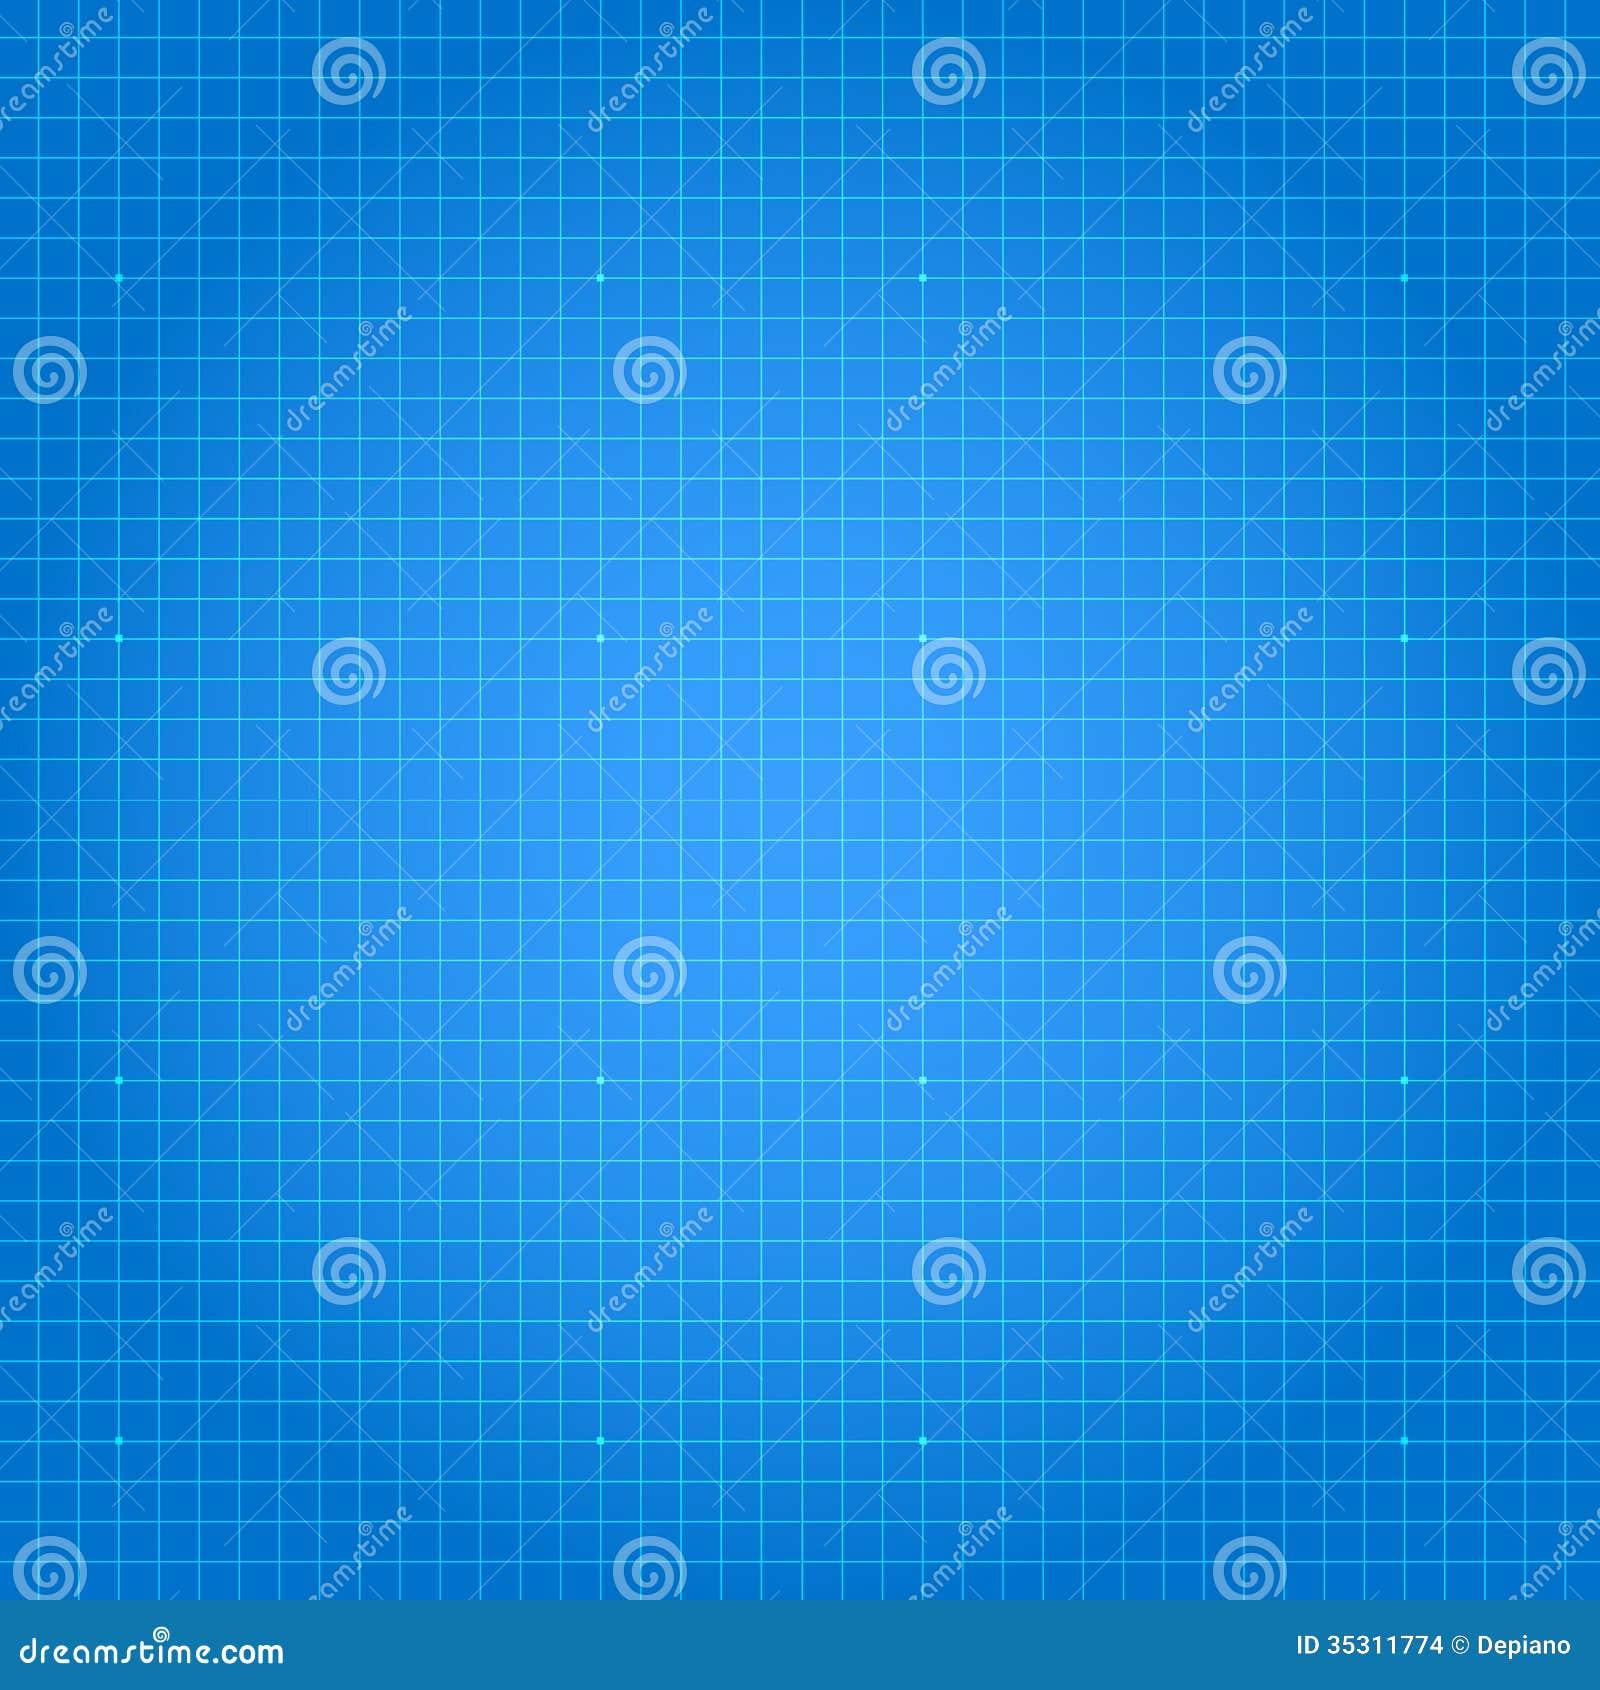 Blueprint seamless background stock vector illustration of math royalty free stock photo malvernweather Gallery